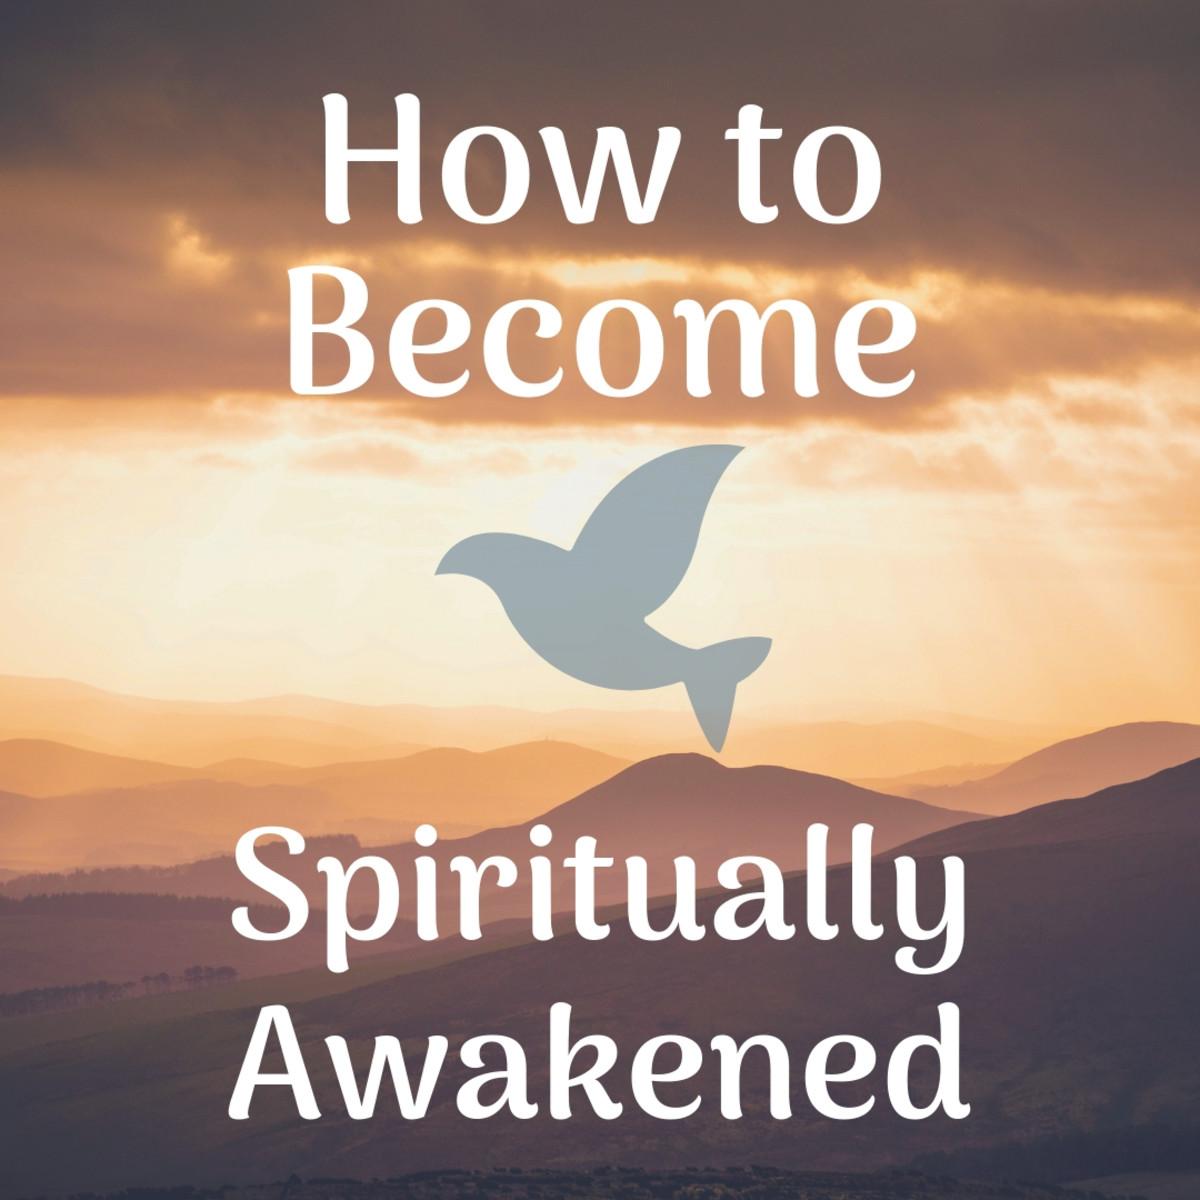 Spiritual Awakening and Characteristics of a Spiritually Awakened Person